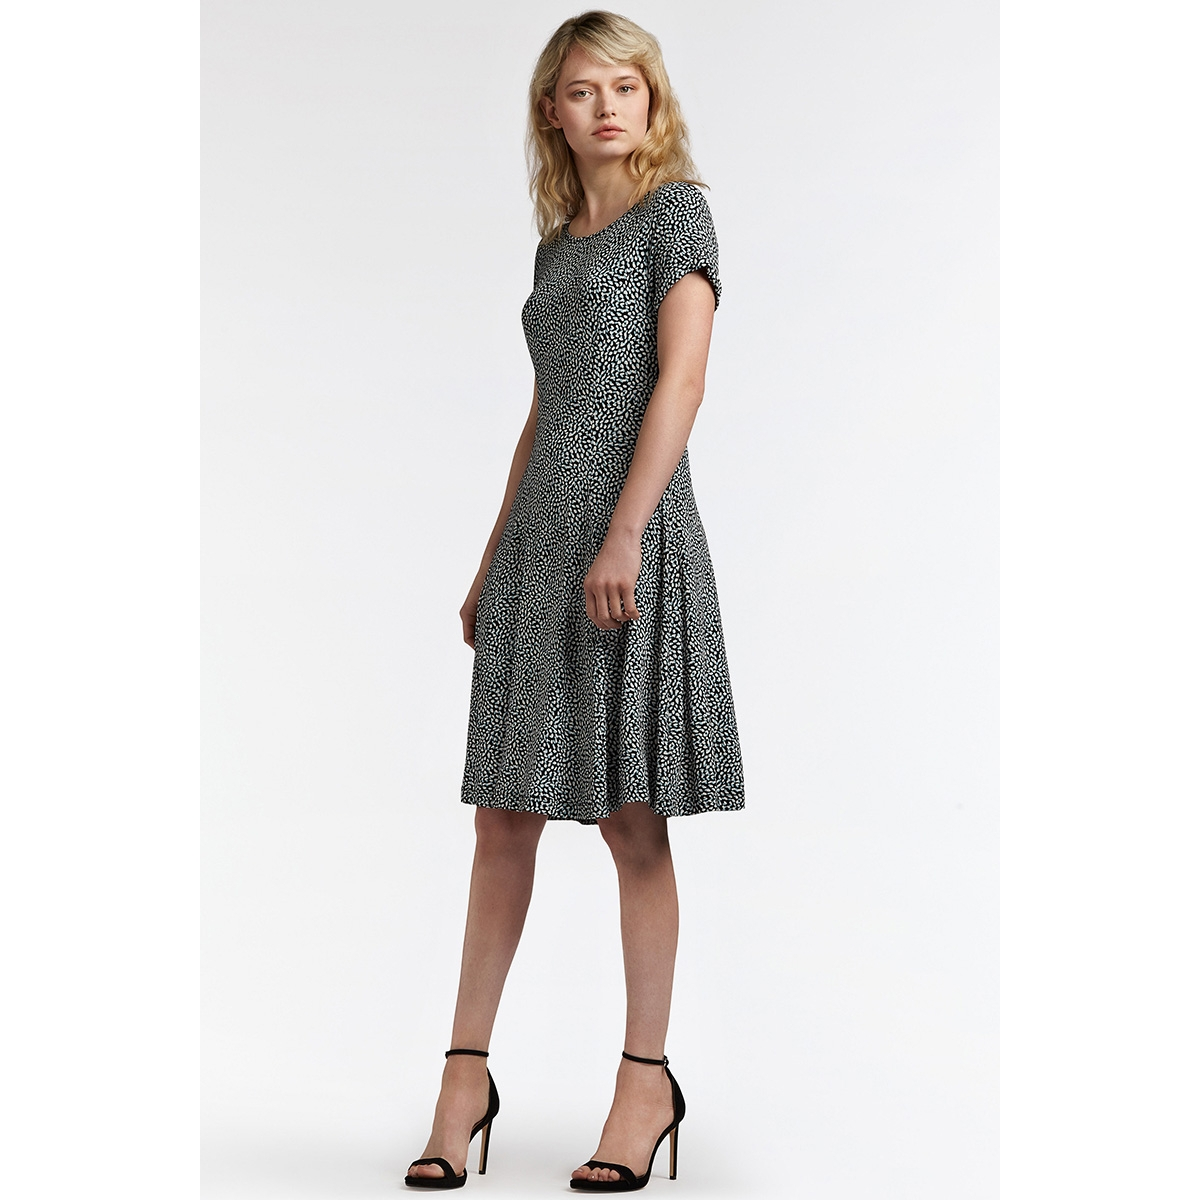 c4b537ca354911 ... zwierige jurk met print 23001559 sandwich jurk 41010 ...